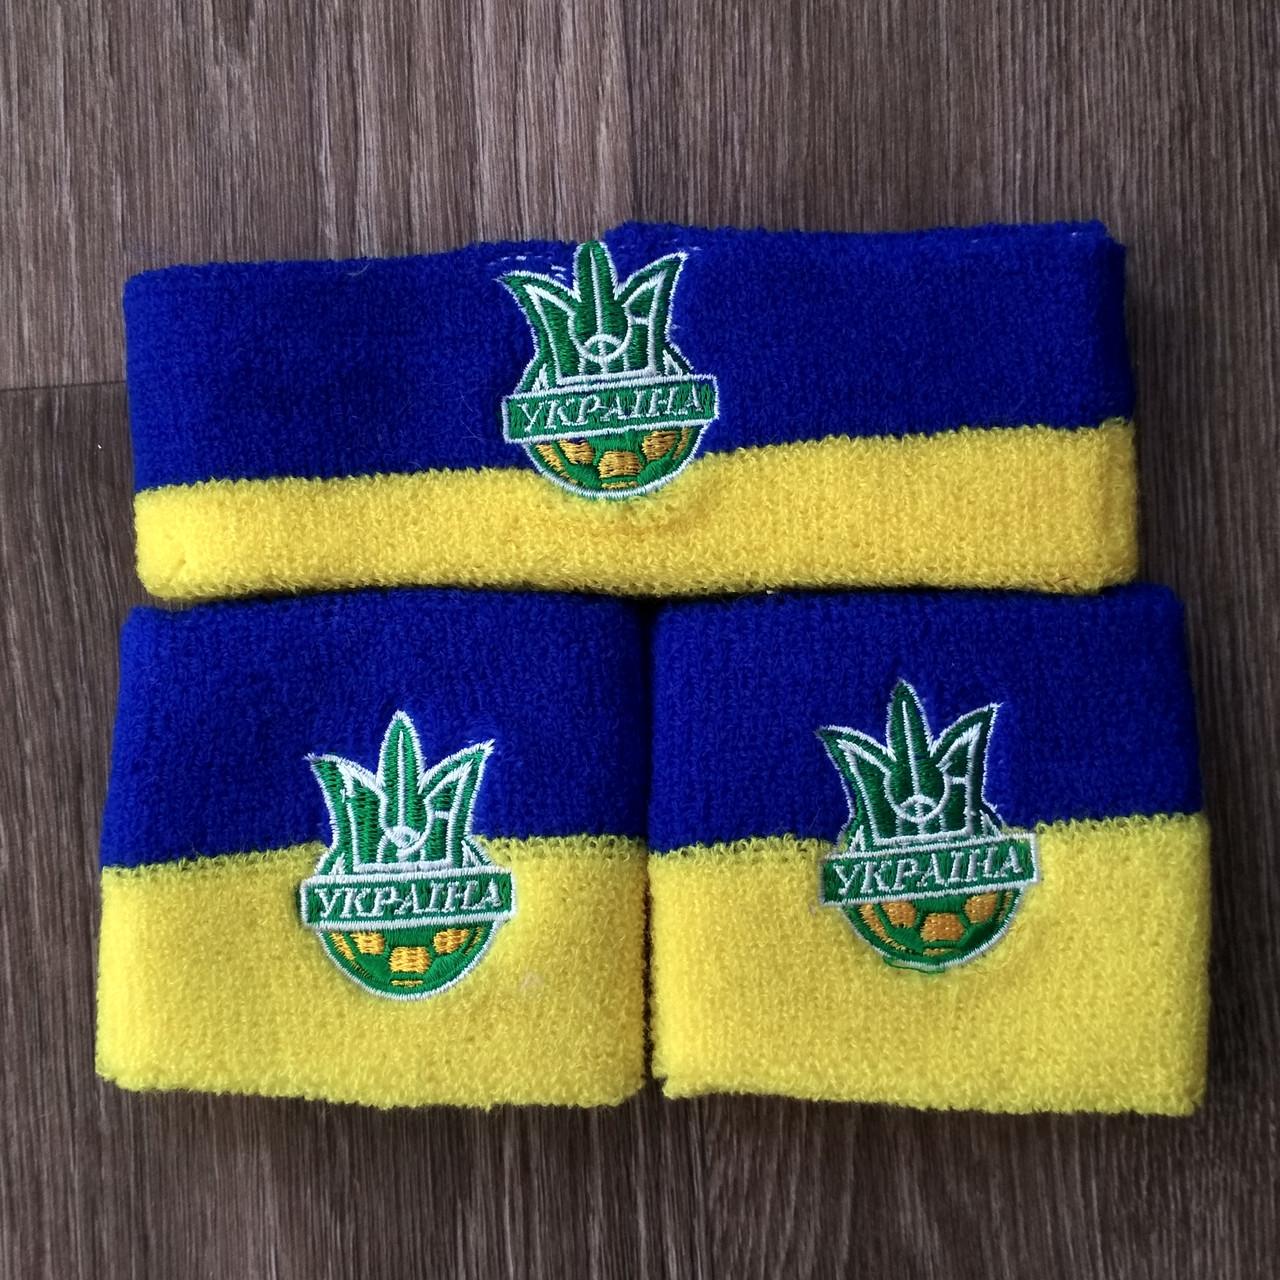 Комплект повязка на голову и напульсники Украина синий